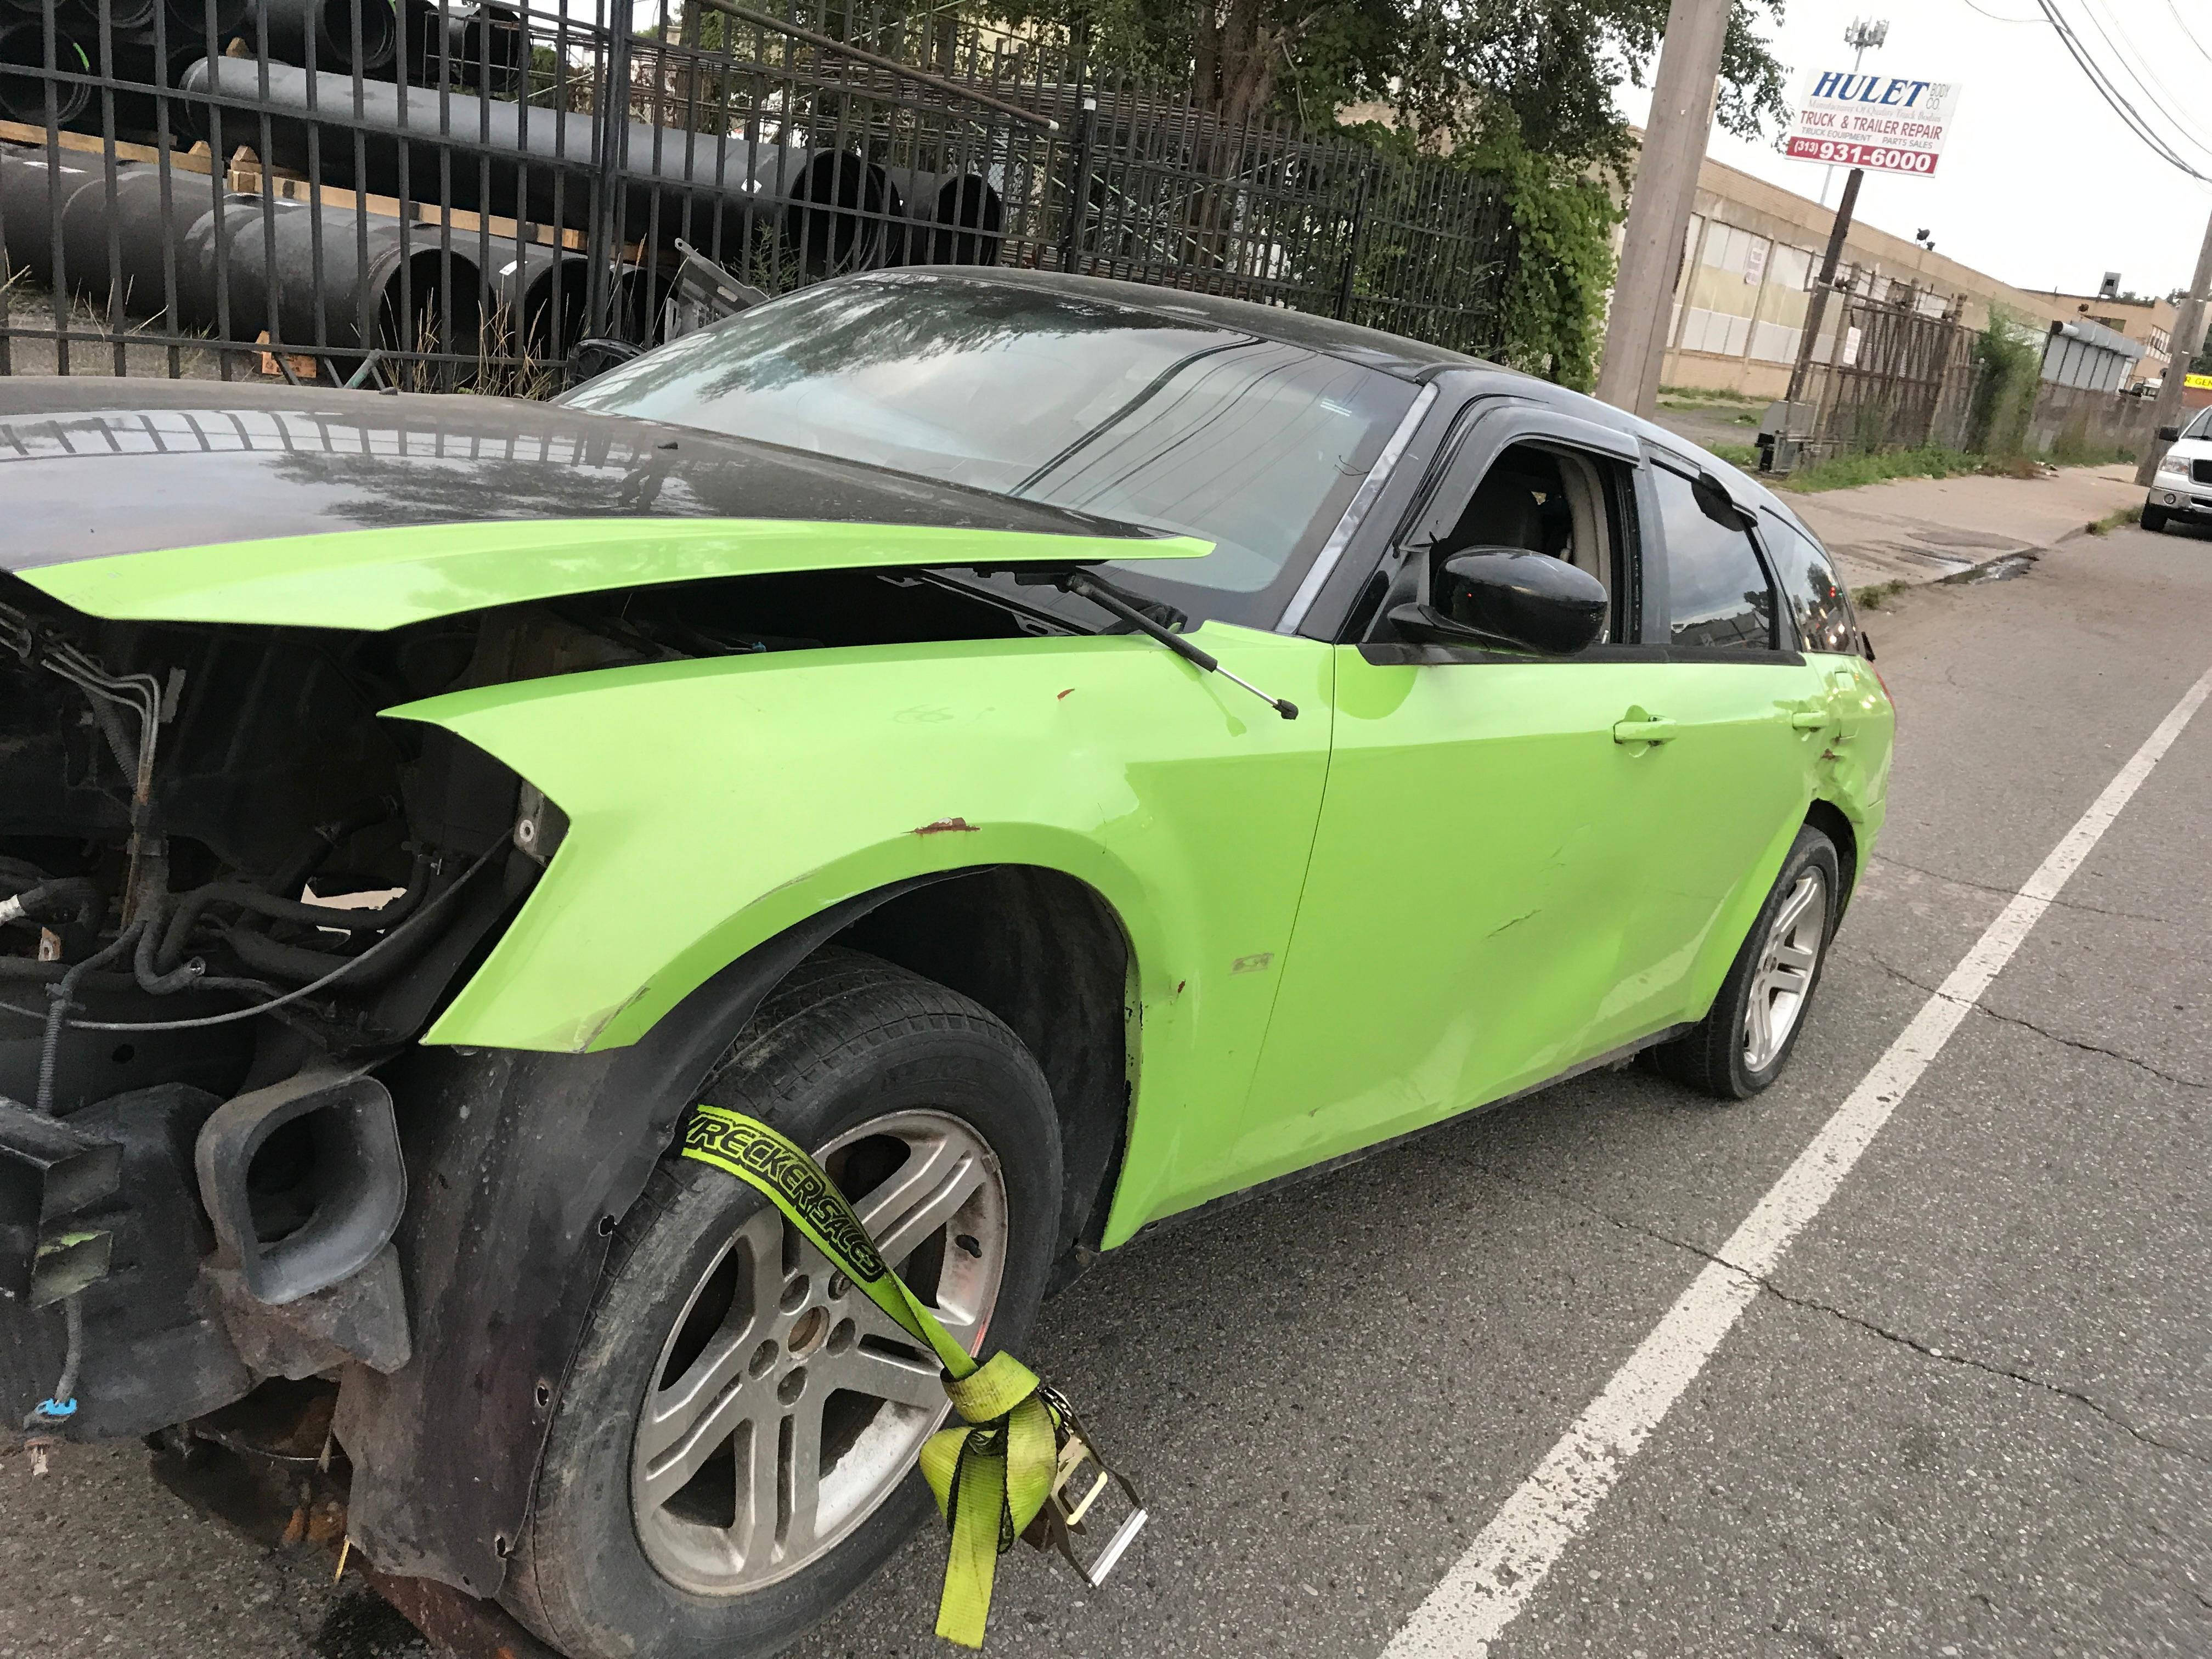 Junk Car Top Dollar - Salvage Dearborn Michigan